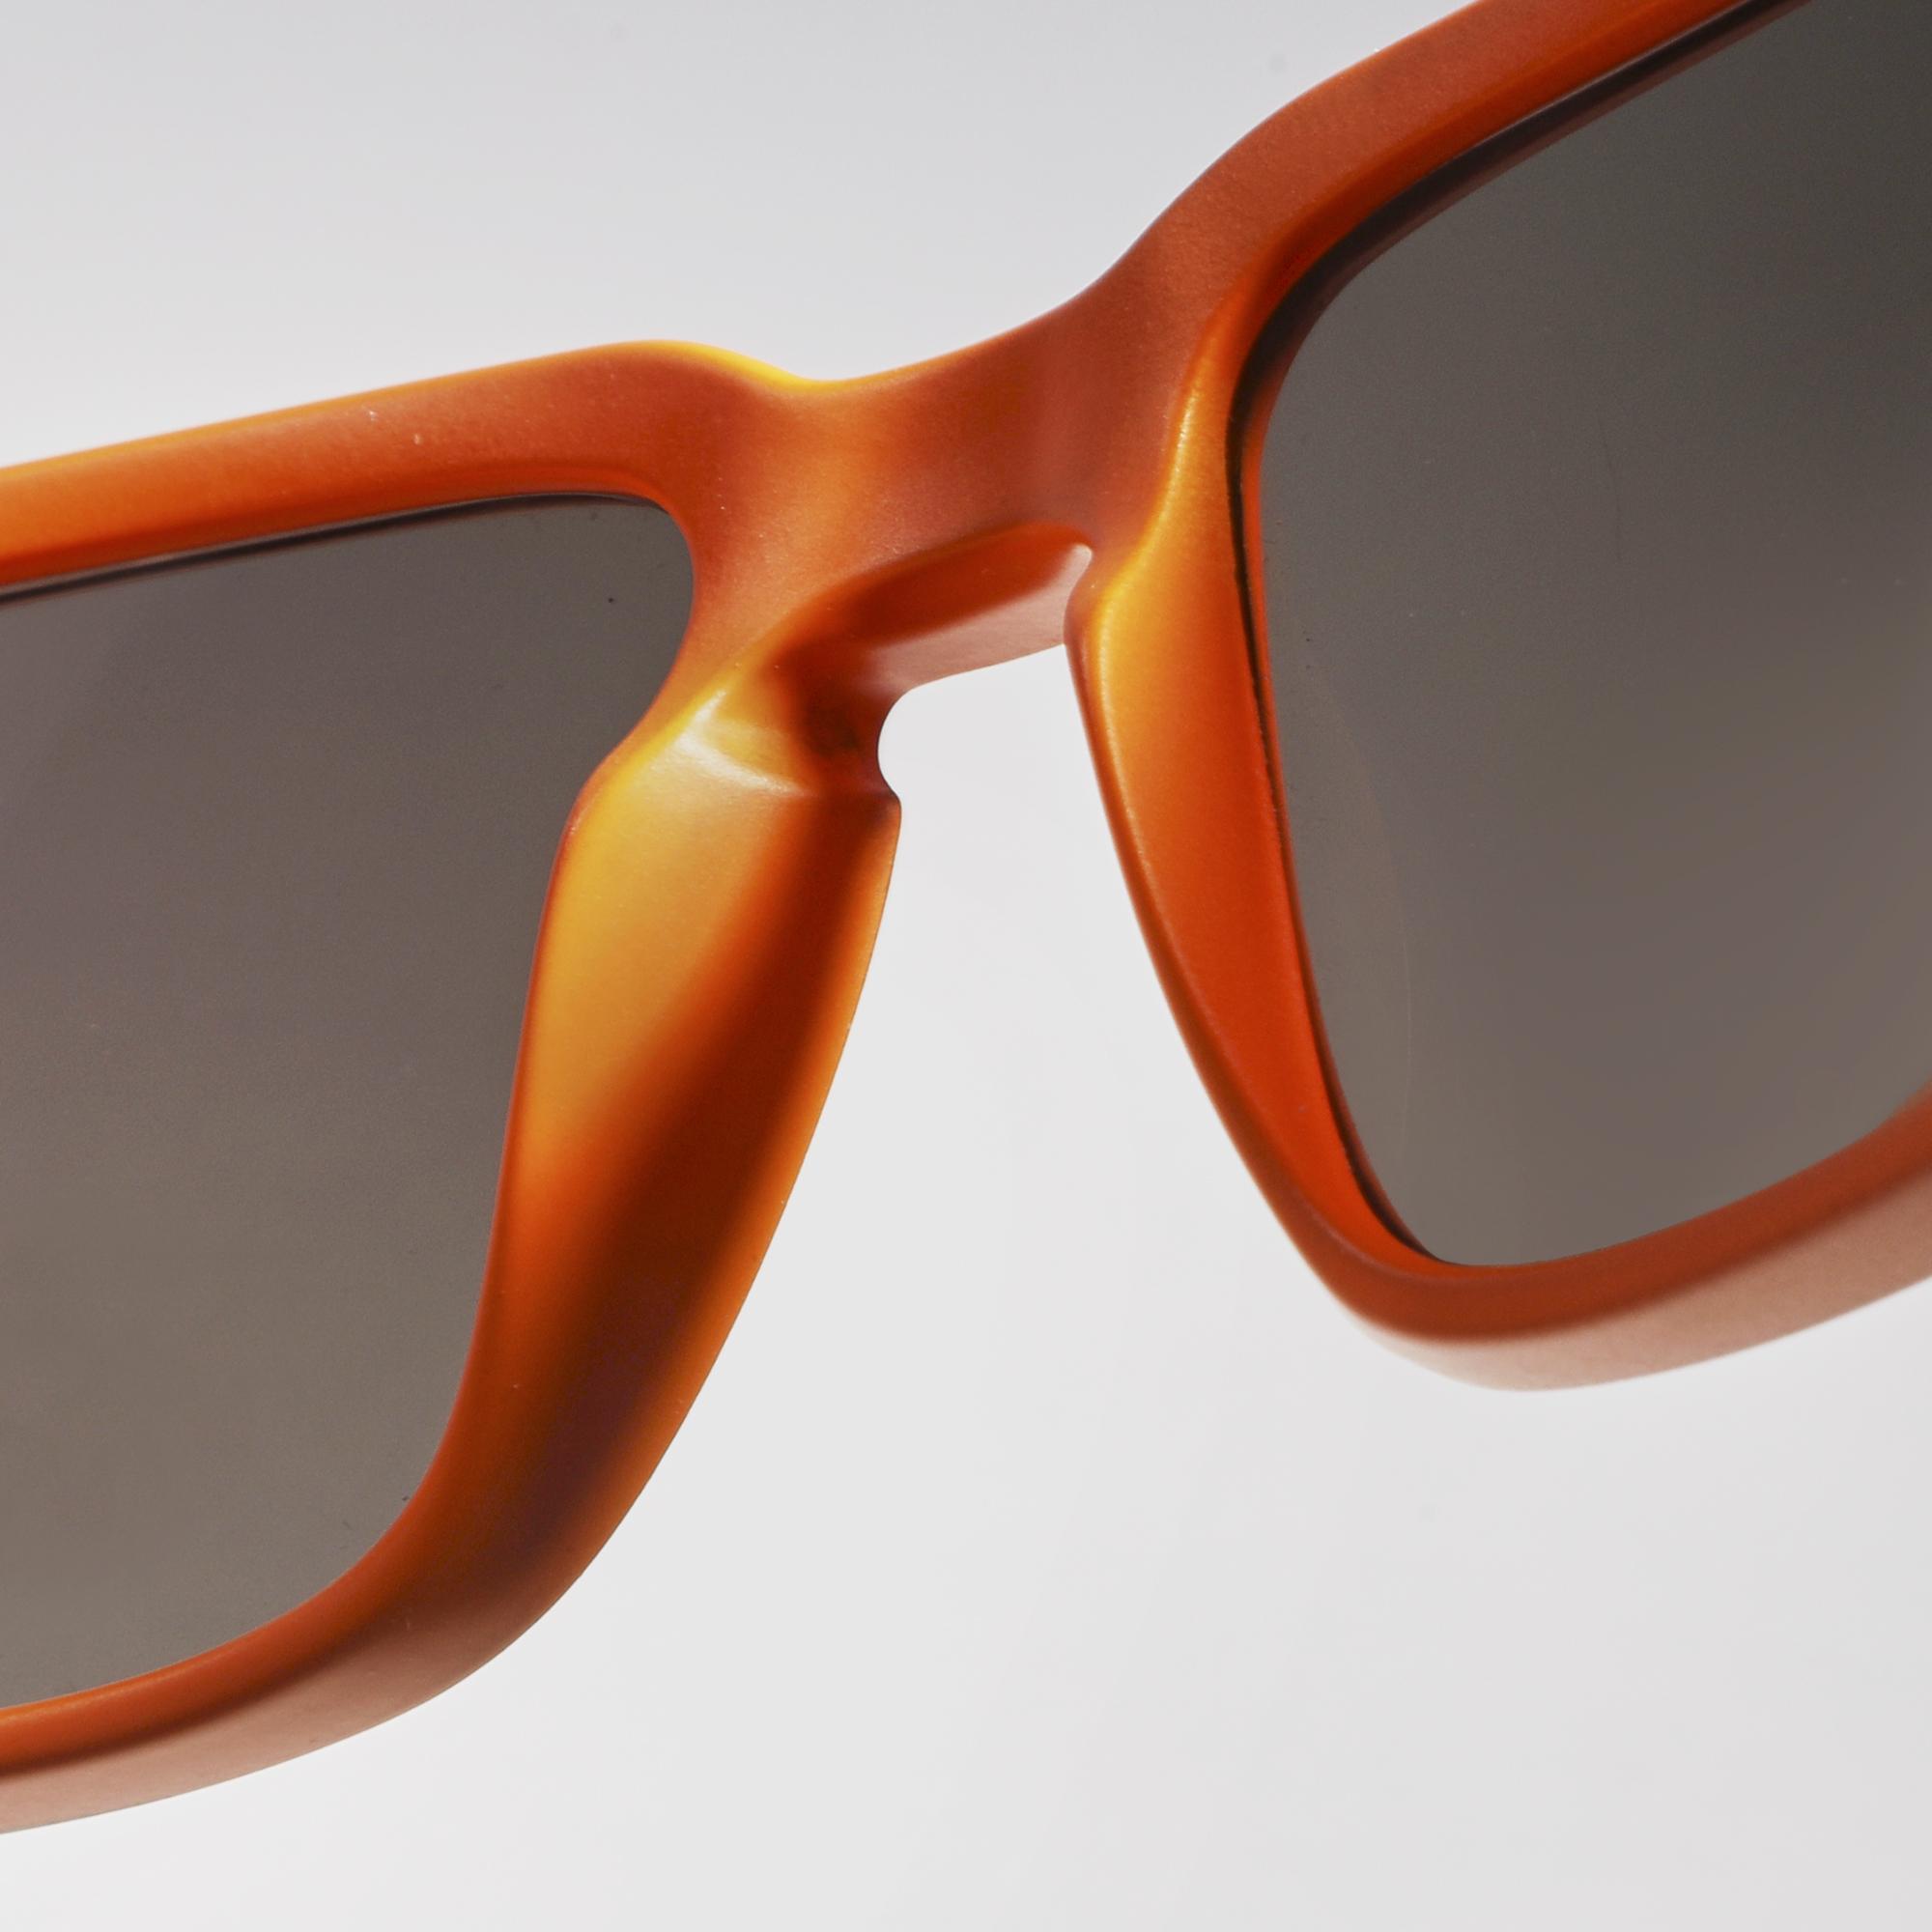 Experimental Edition Evolution FLT Sunglasses - Close Up inside